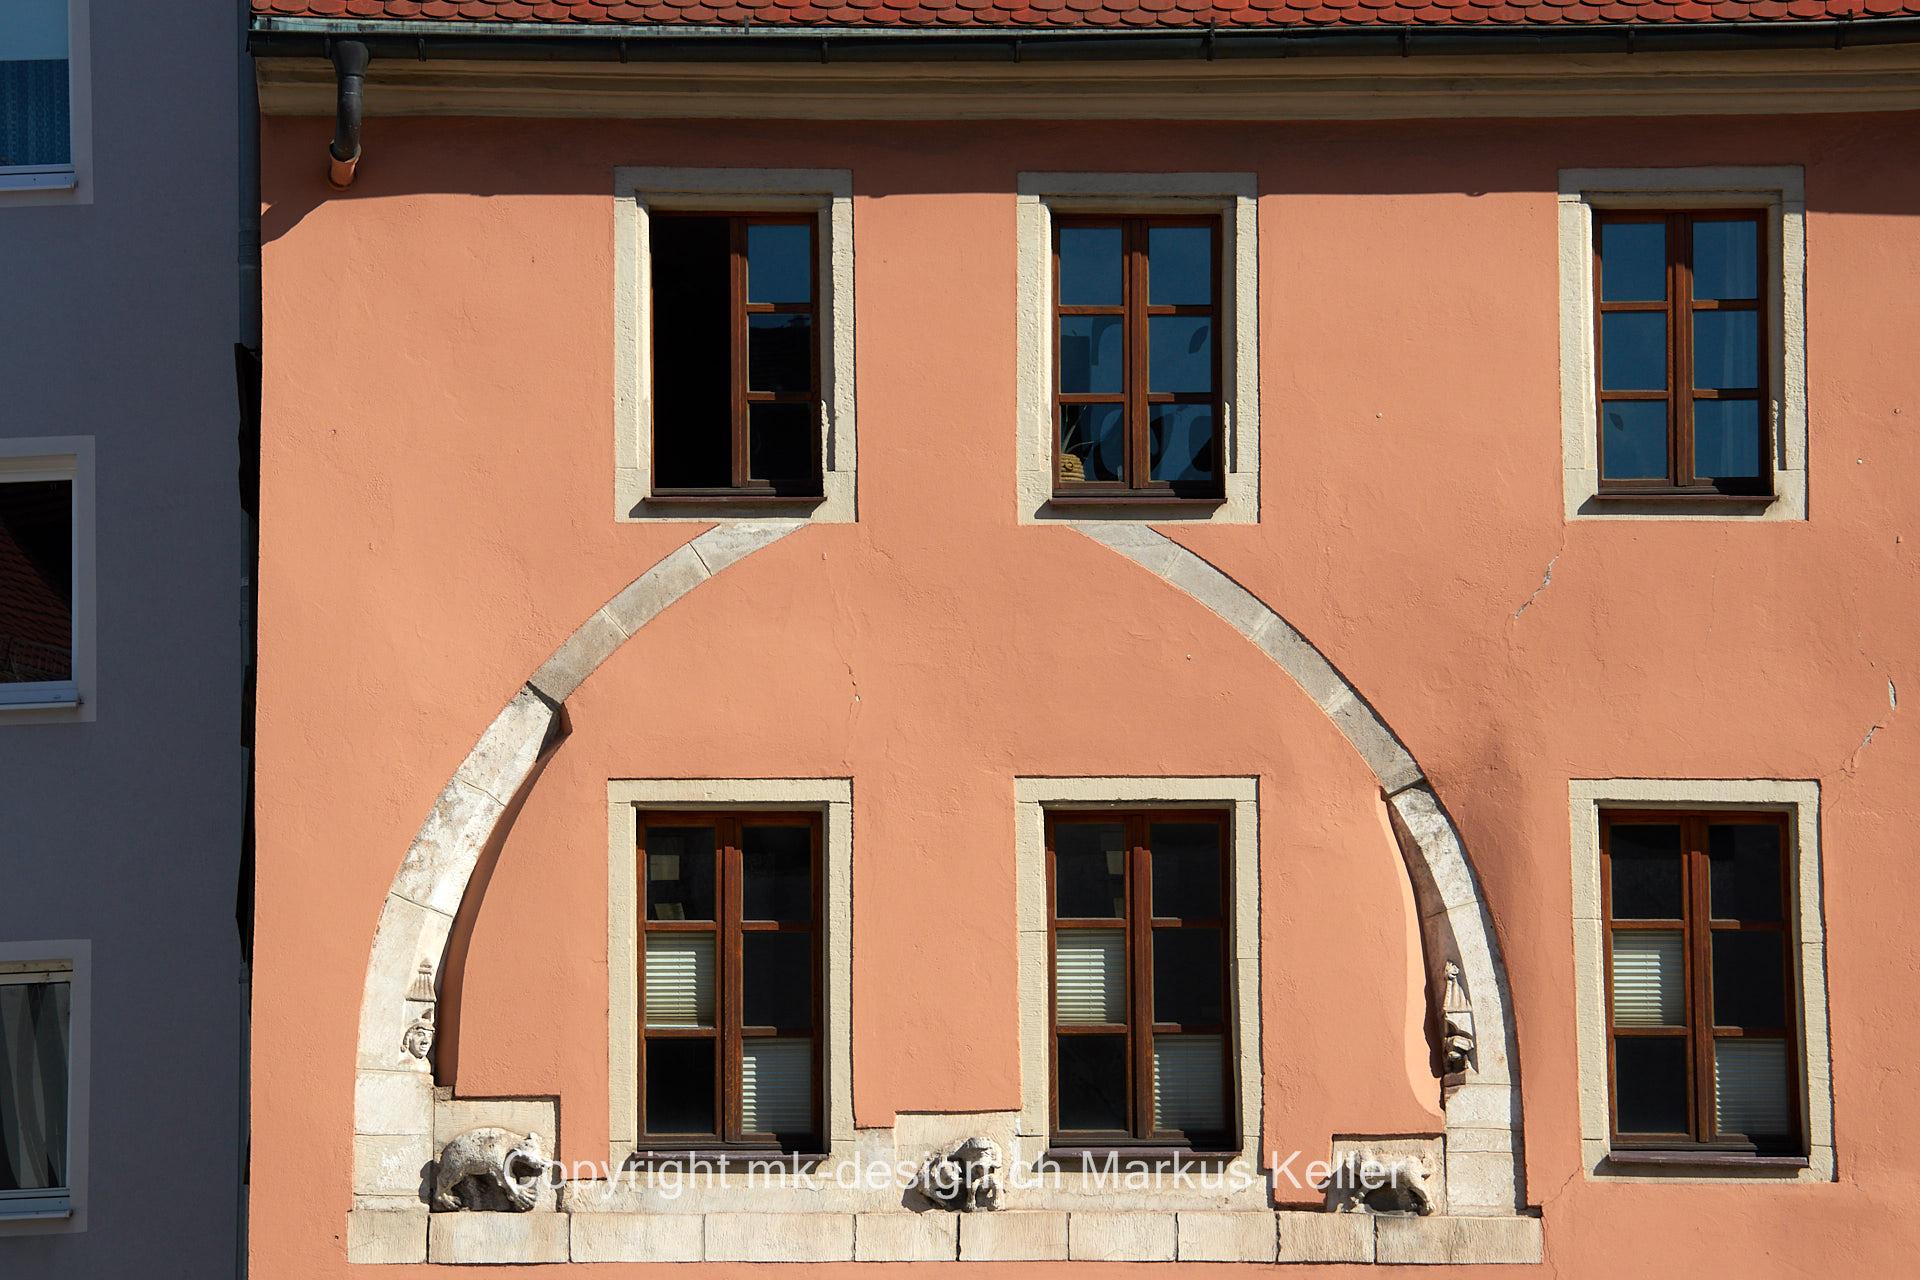 Bauwerk   Fenster   Fassade